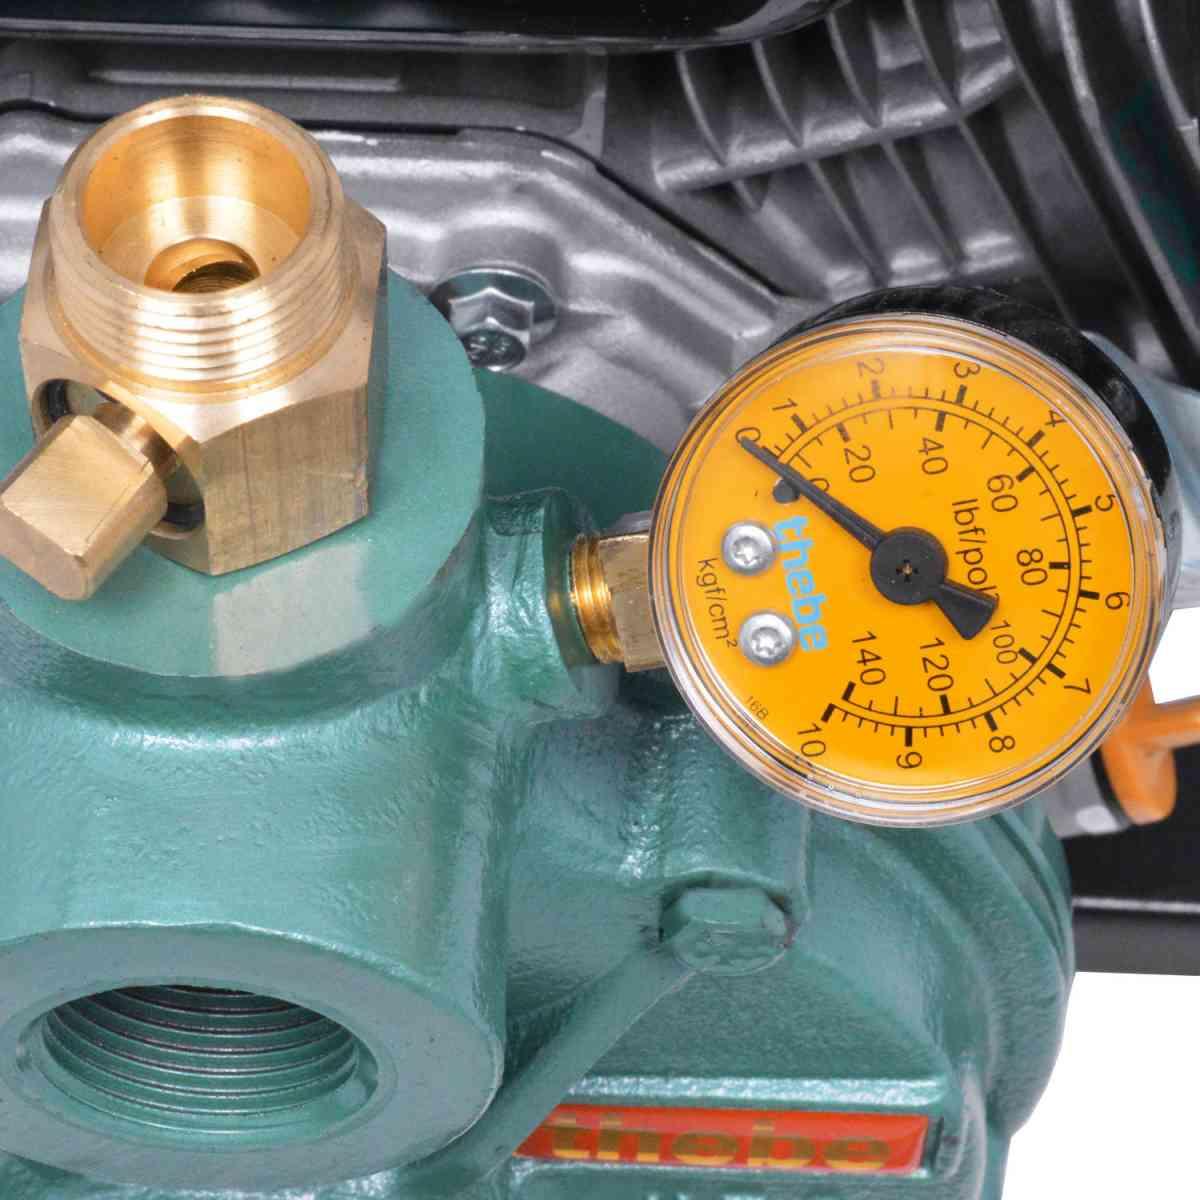 Motobomba a Gasolina 3 M³/H Injetora TI30C55FX1 Toyama